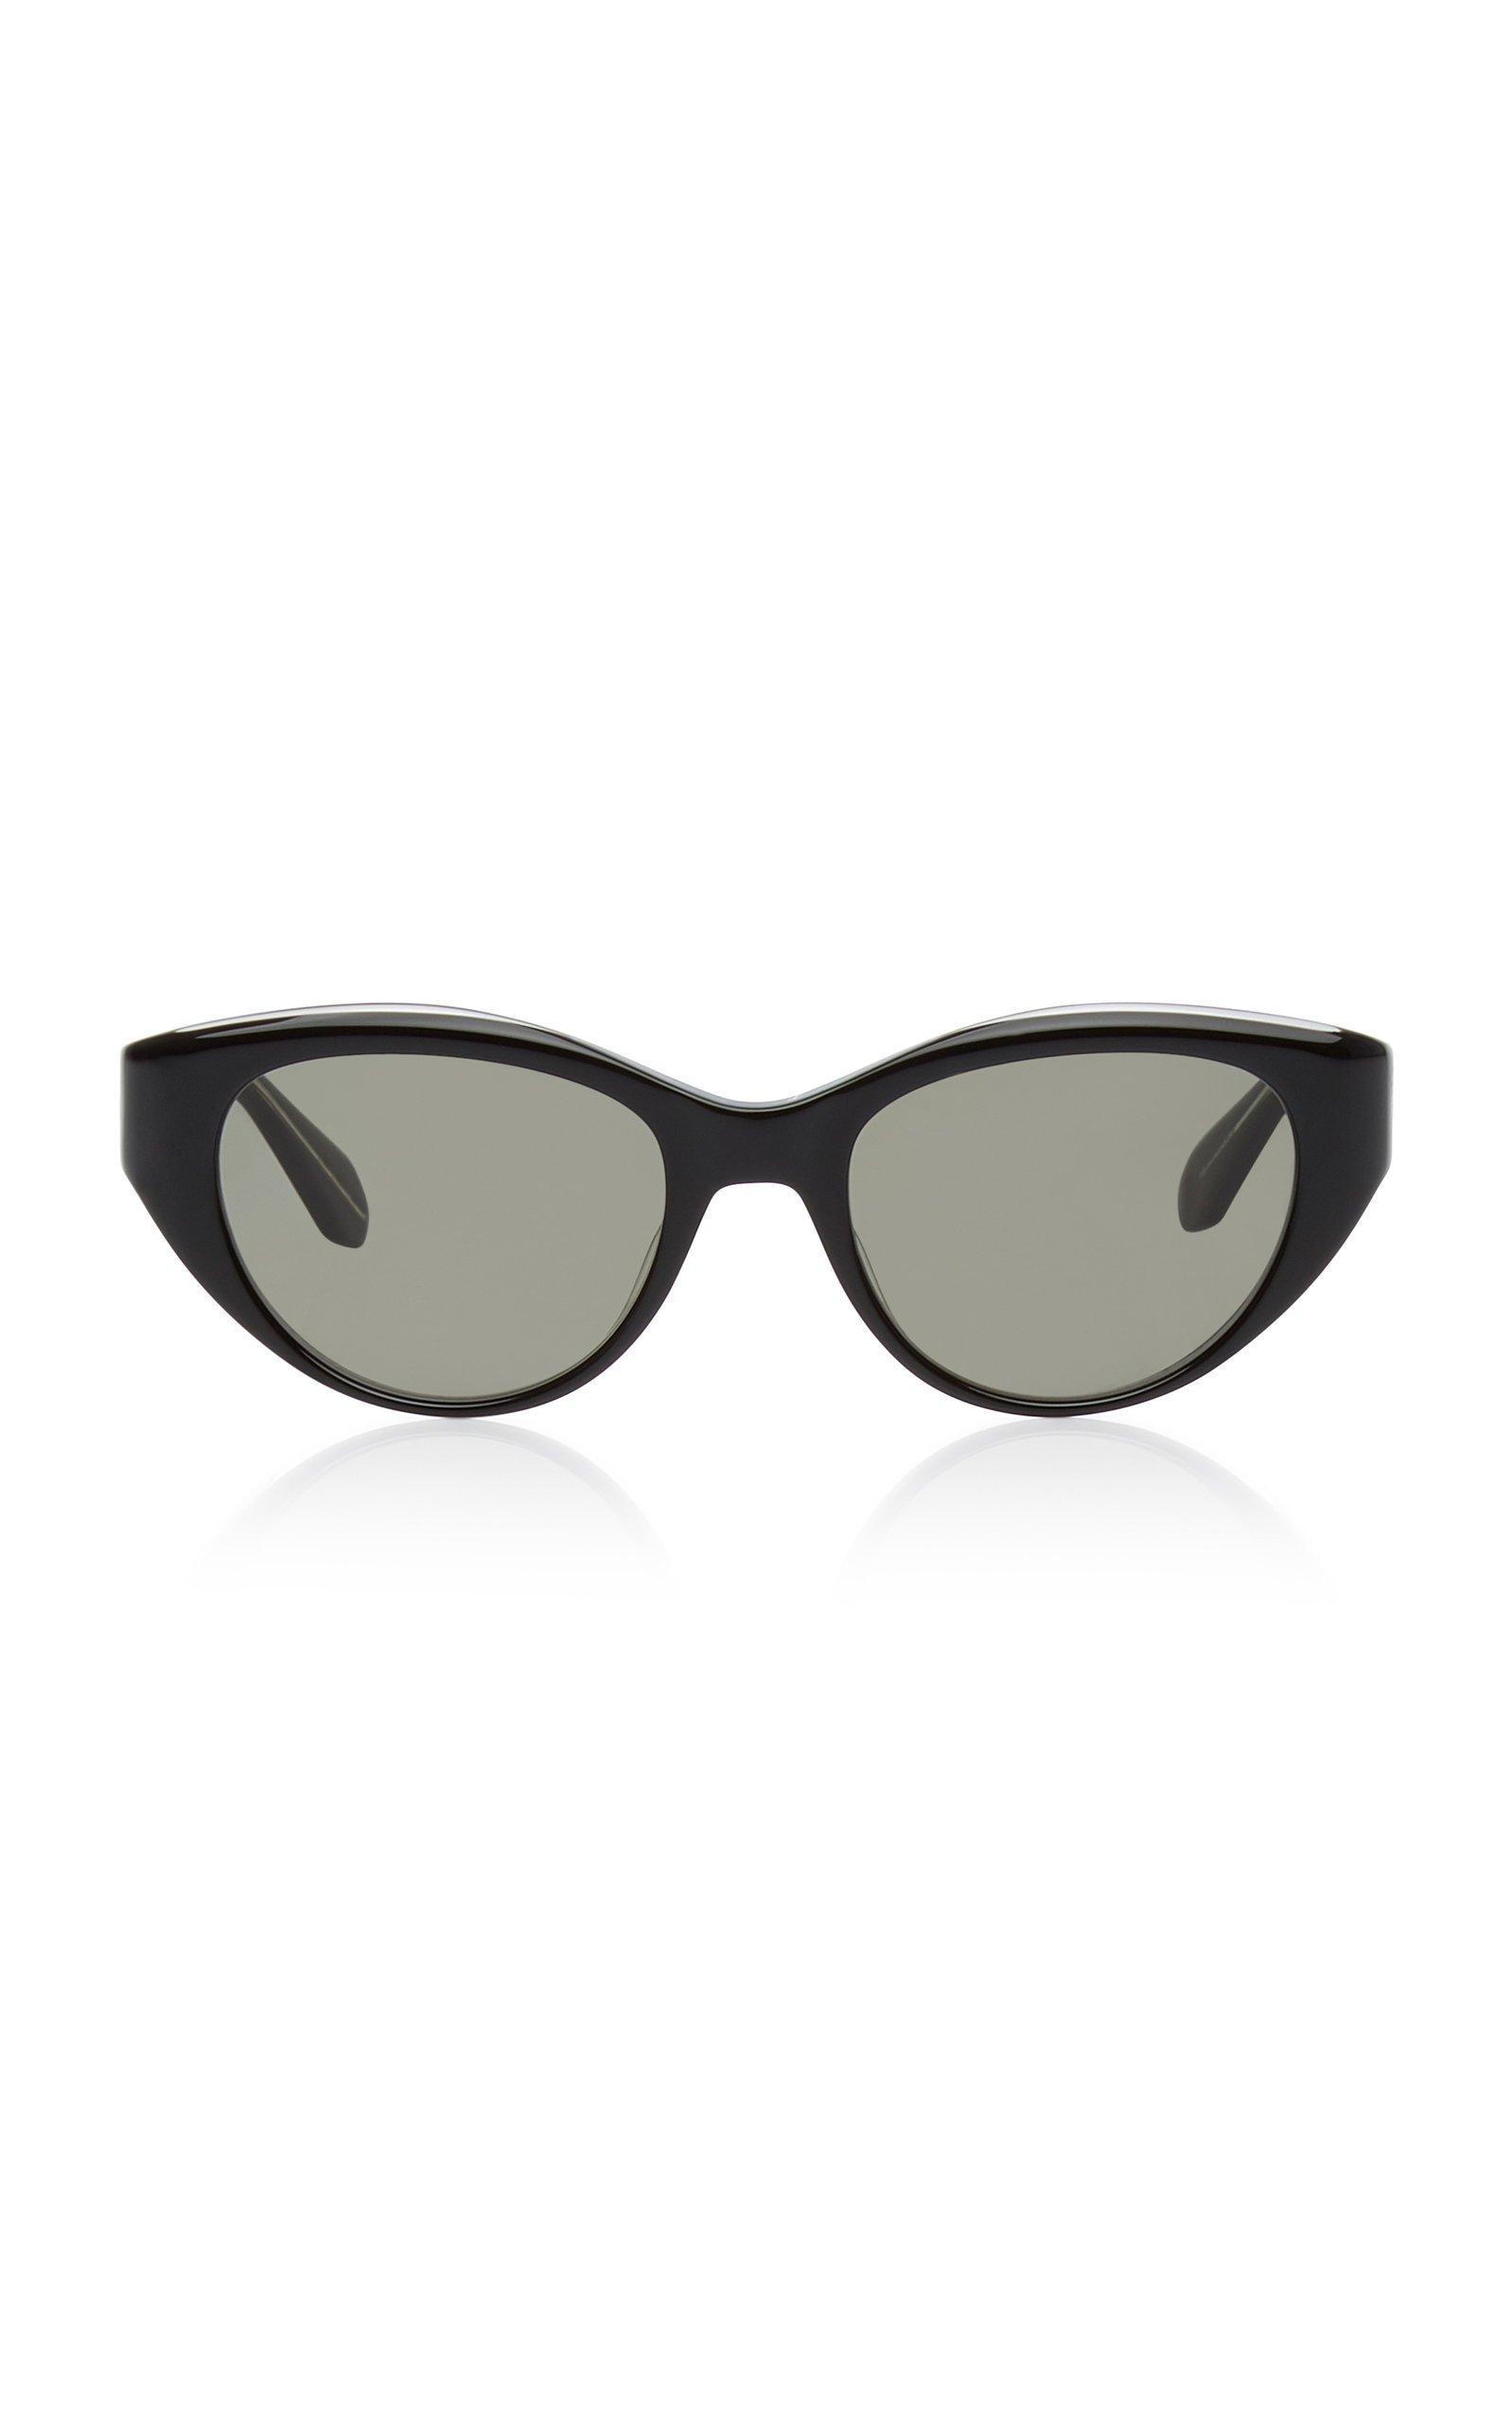 Garrett Leight Del Rey 50 Black Acetate Round-Frame Sunglasses